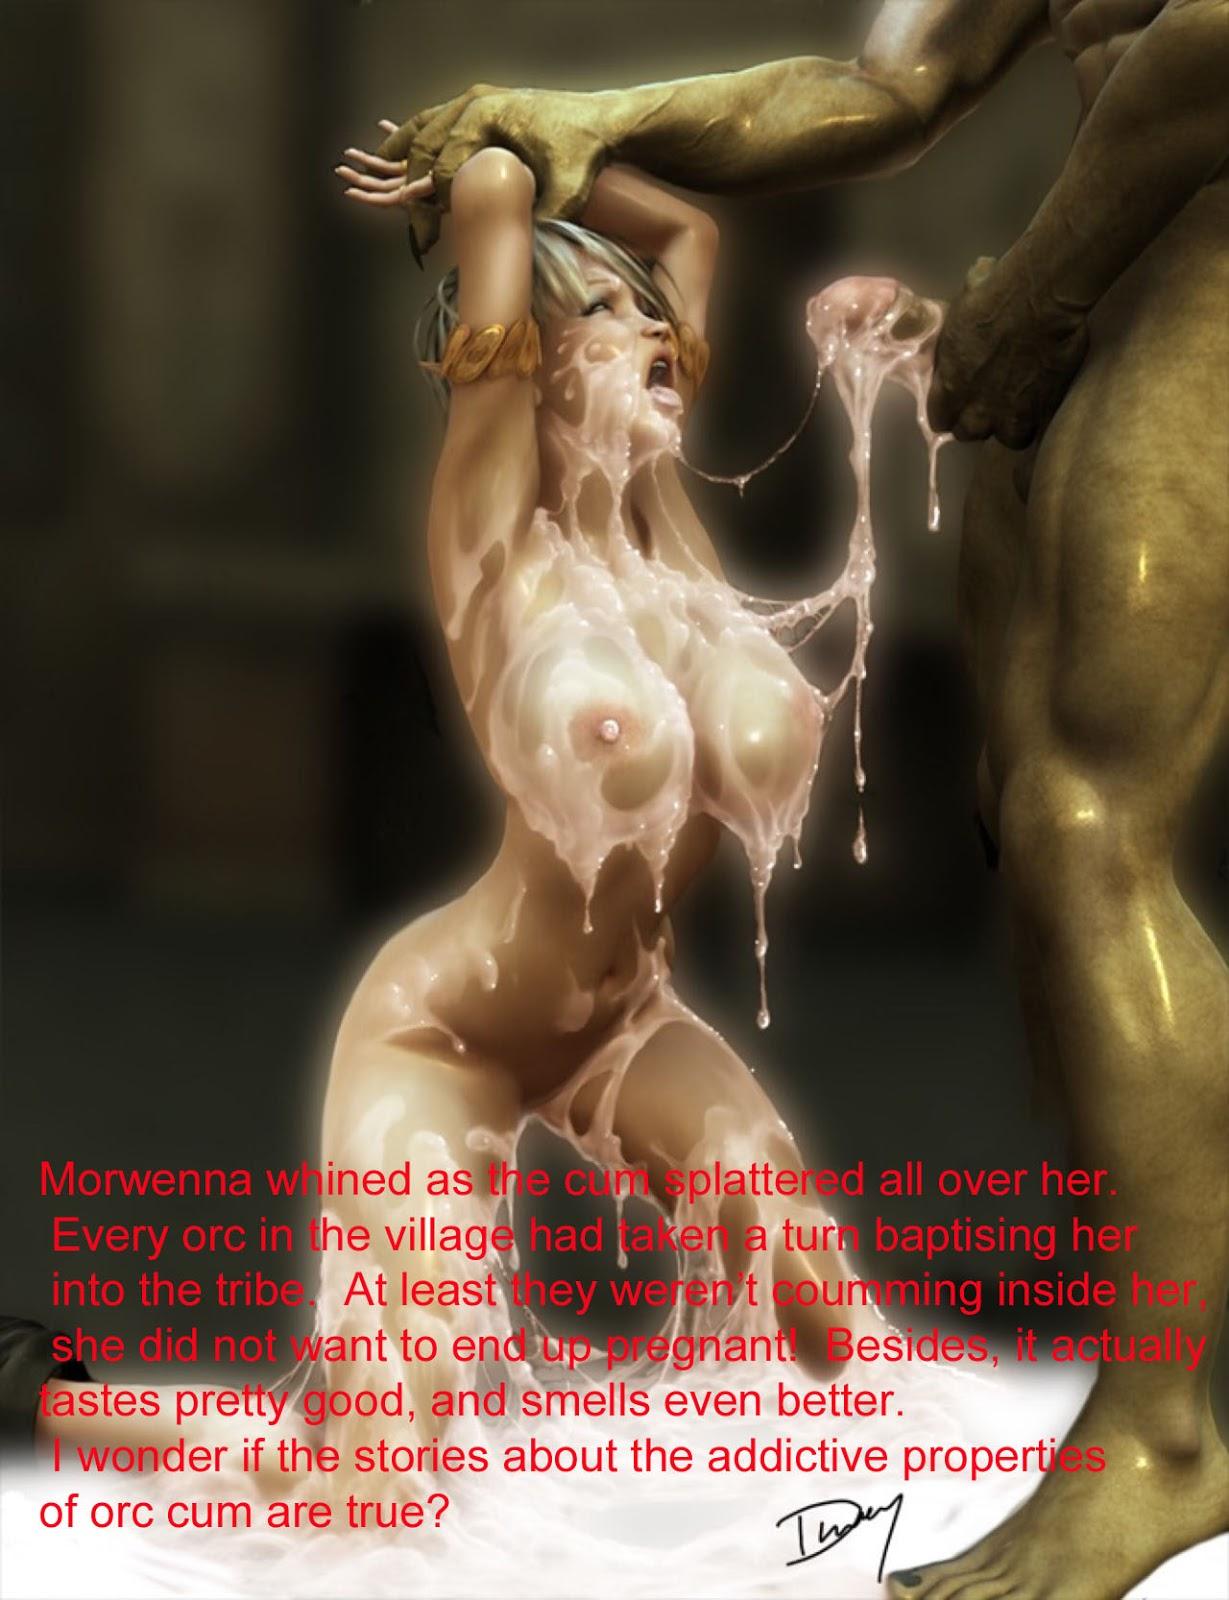 Хентай картинки  pornmultorg